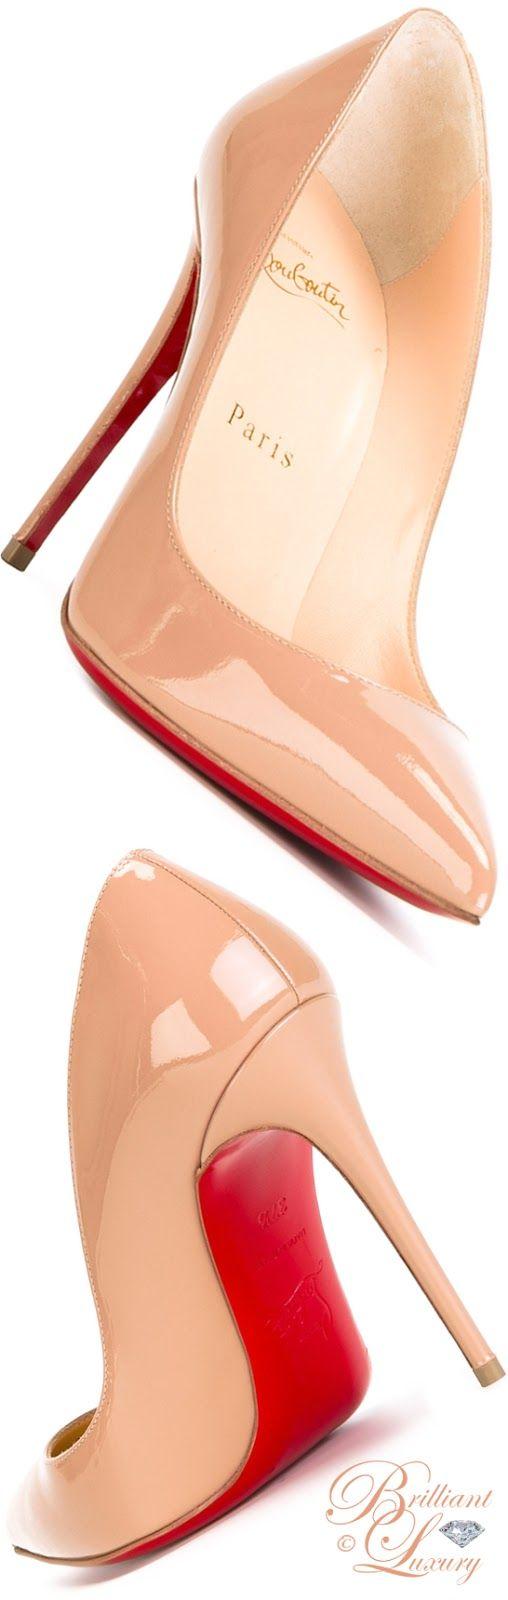 Brilliant Luxury by Emmy DE ♦ Christian Louboutin Pigalle Follies pumps